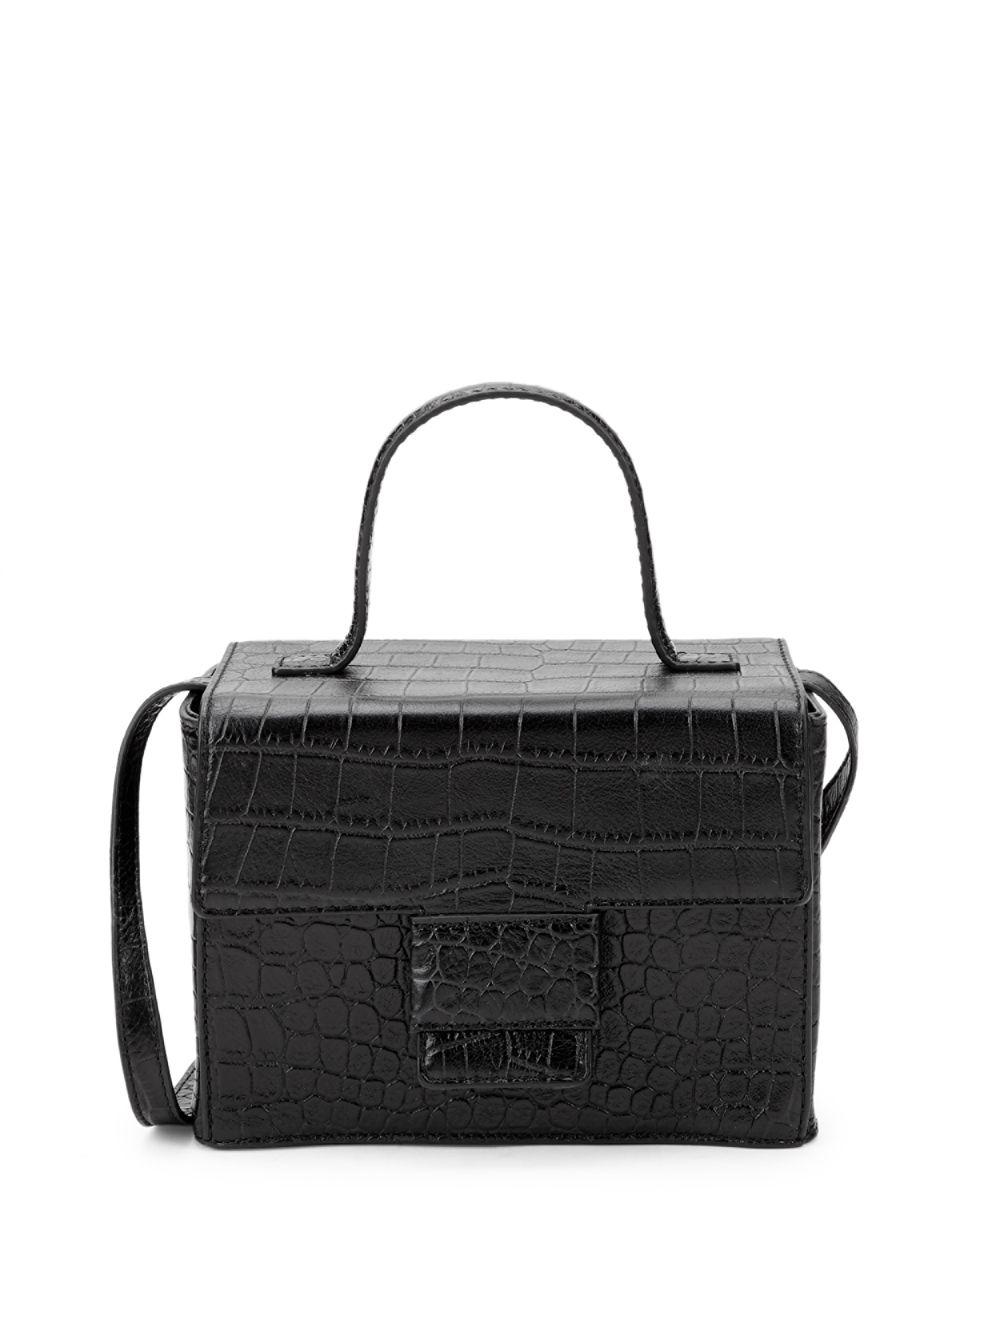 b1740a7ef8ea Lyst - Steven Alan Classic Embossed Leather Crossbody Bag in Black